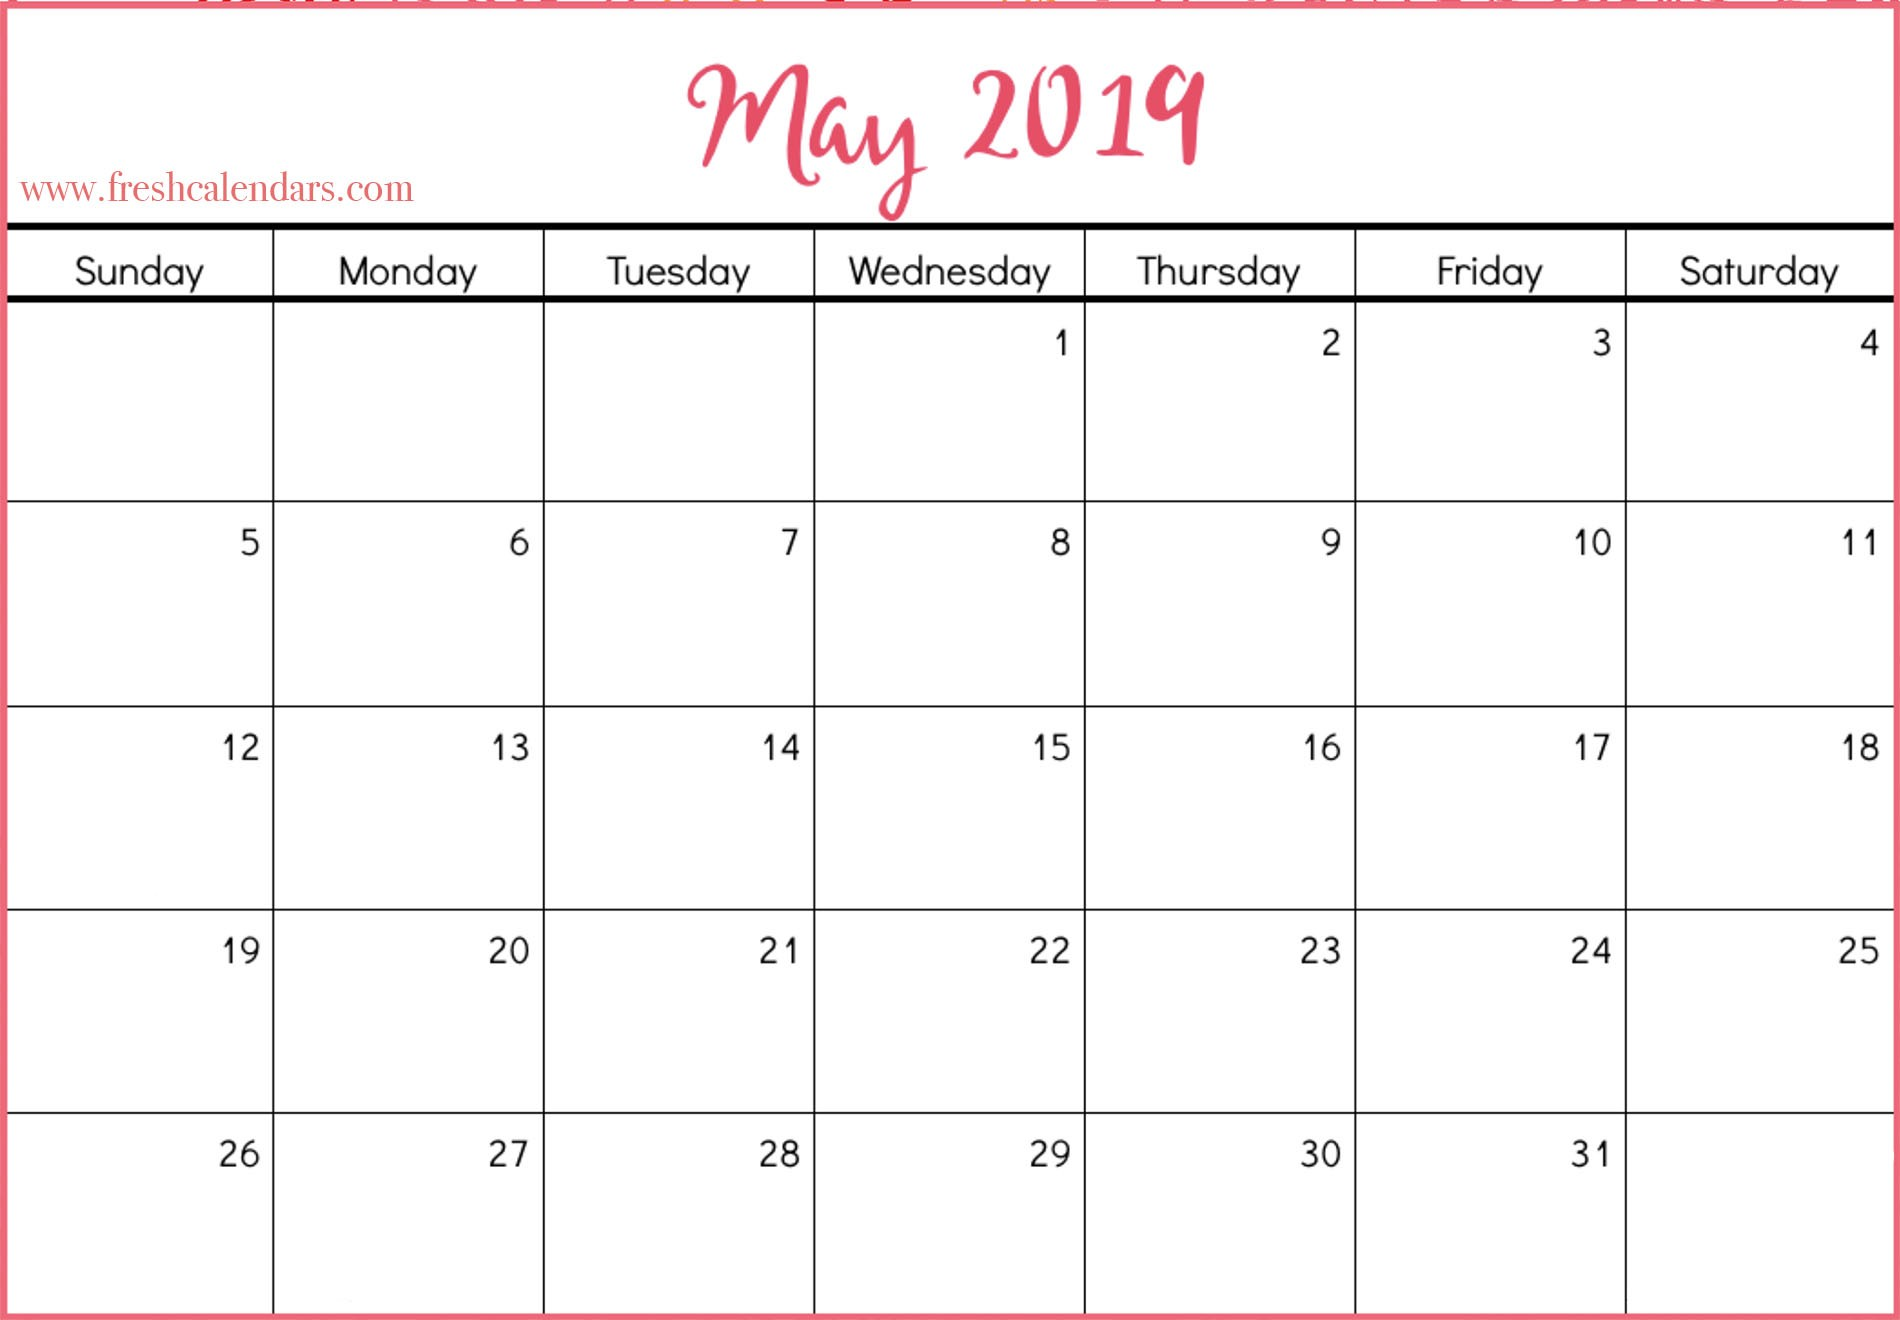 Calendar 2019 Free Printable Monthly Printable May 2019 Calendar Fresh Calendars